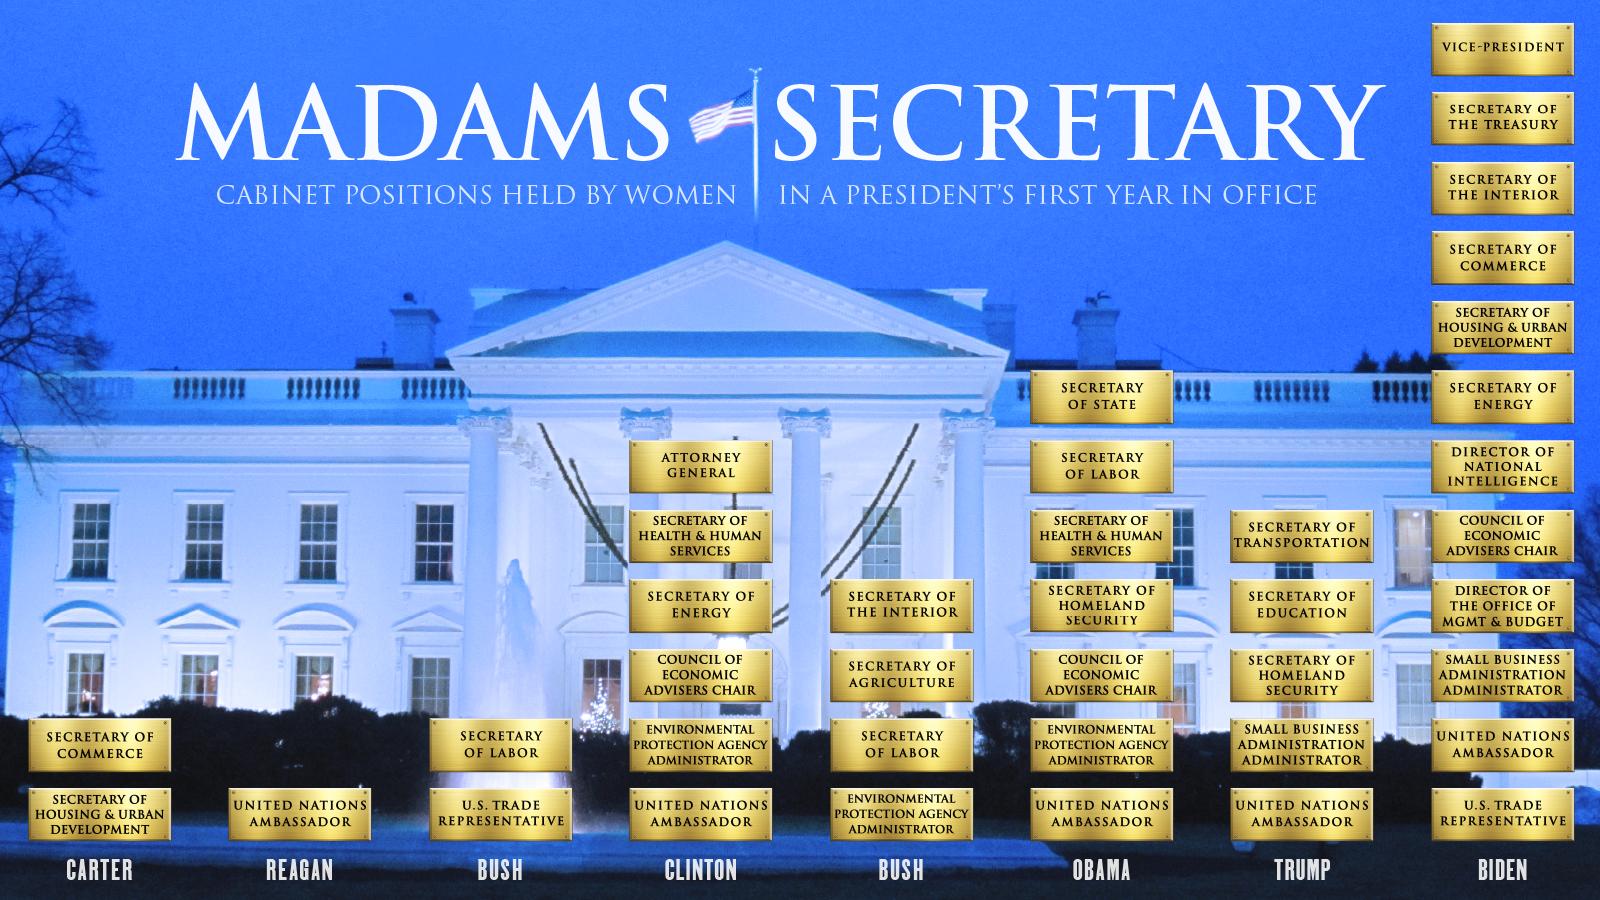 msmagazine.com: A Cabinet That Looks Like America